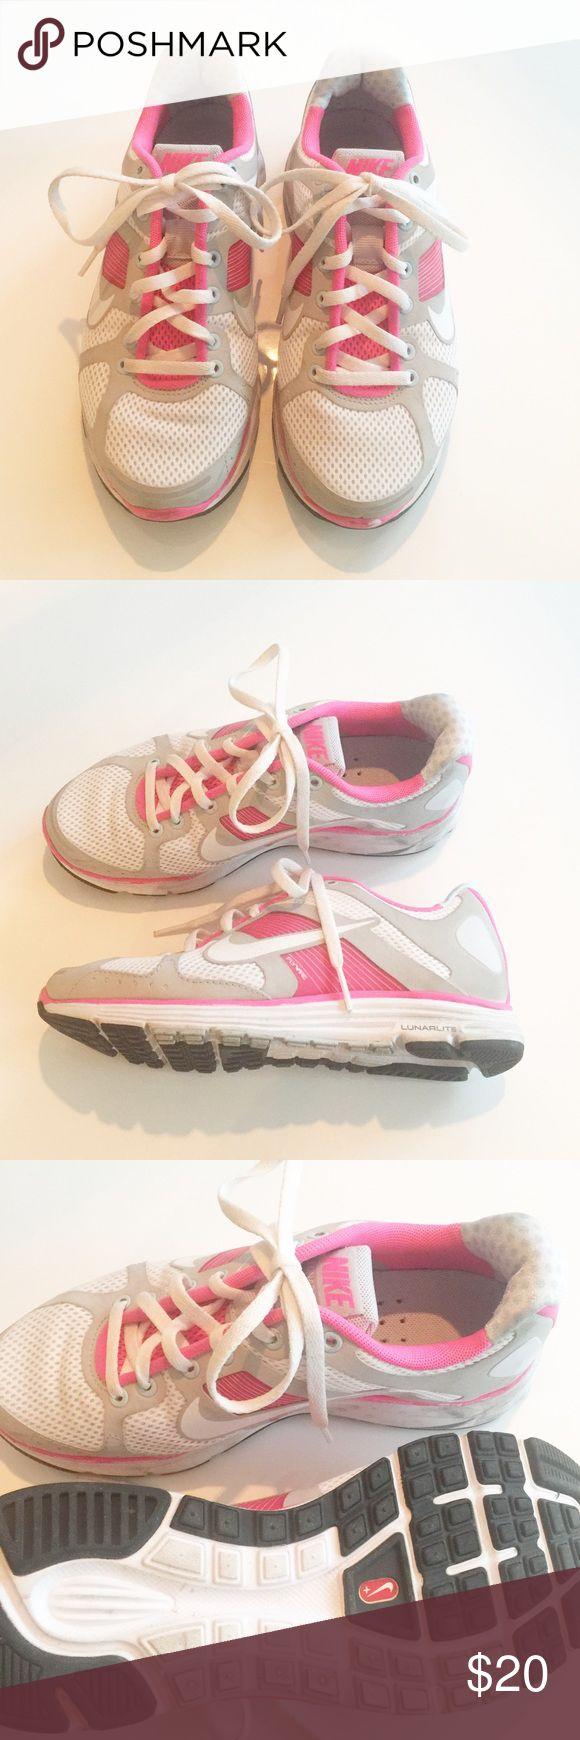 Nike Lunar Elite Nike Lunar Elite   Pink + White   Size 5   Worn a few times! Nike Shoes Athletic Shoes